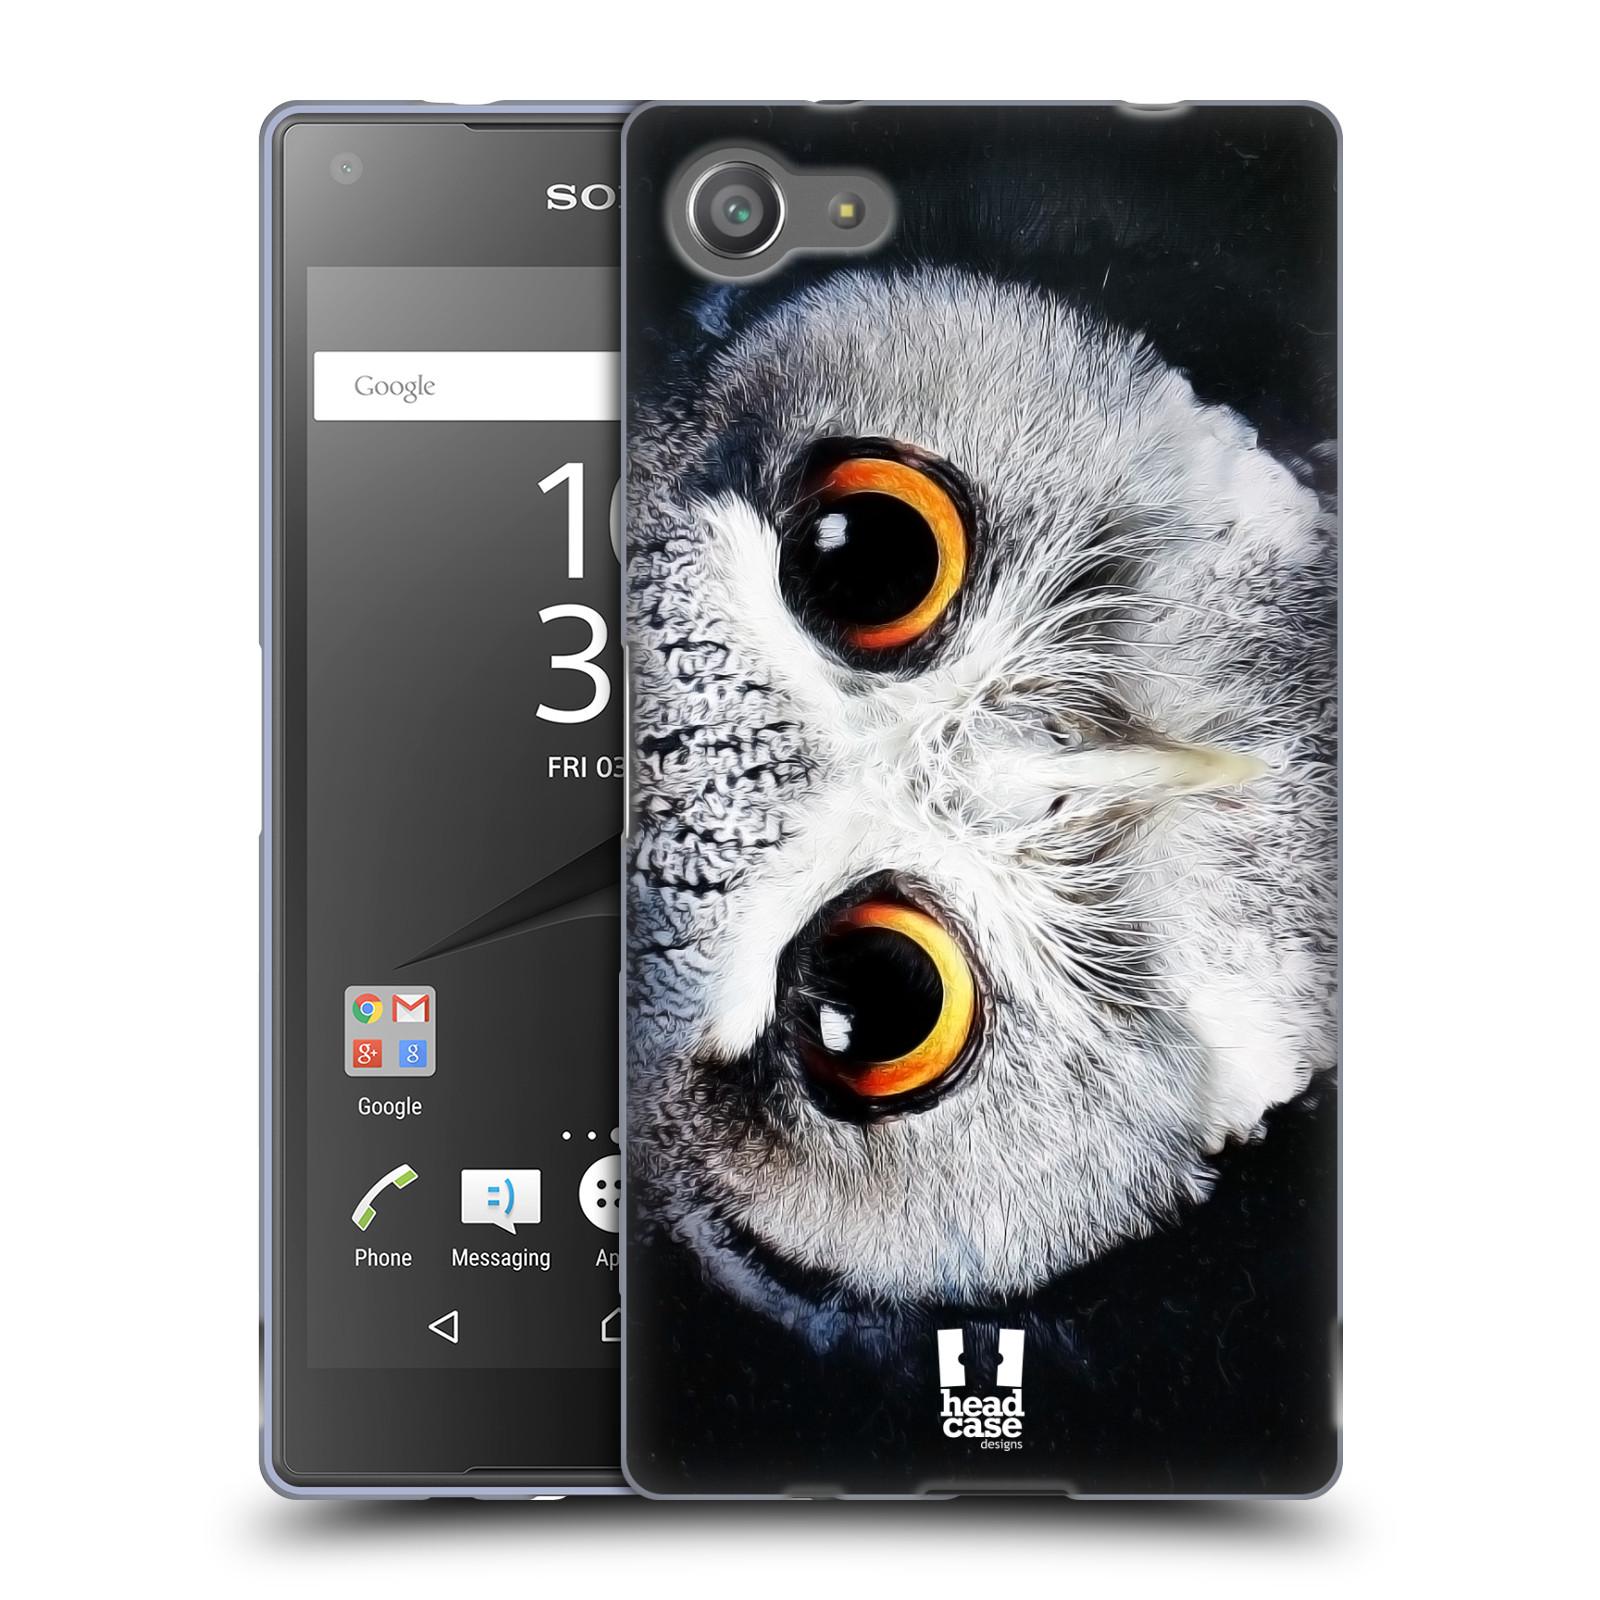 HEAD CASE silikonový obal na mobil Sony Xperia Z5 COMPACT vzor Zvířecí tváře sova